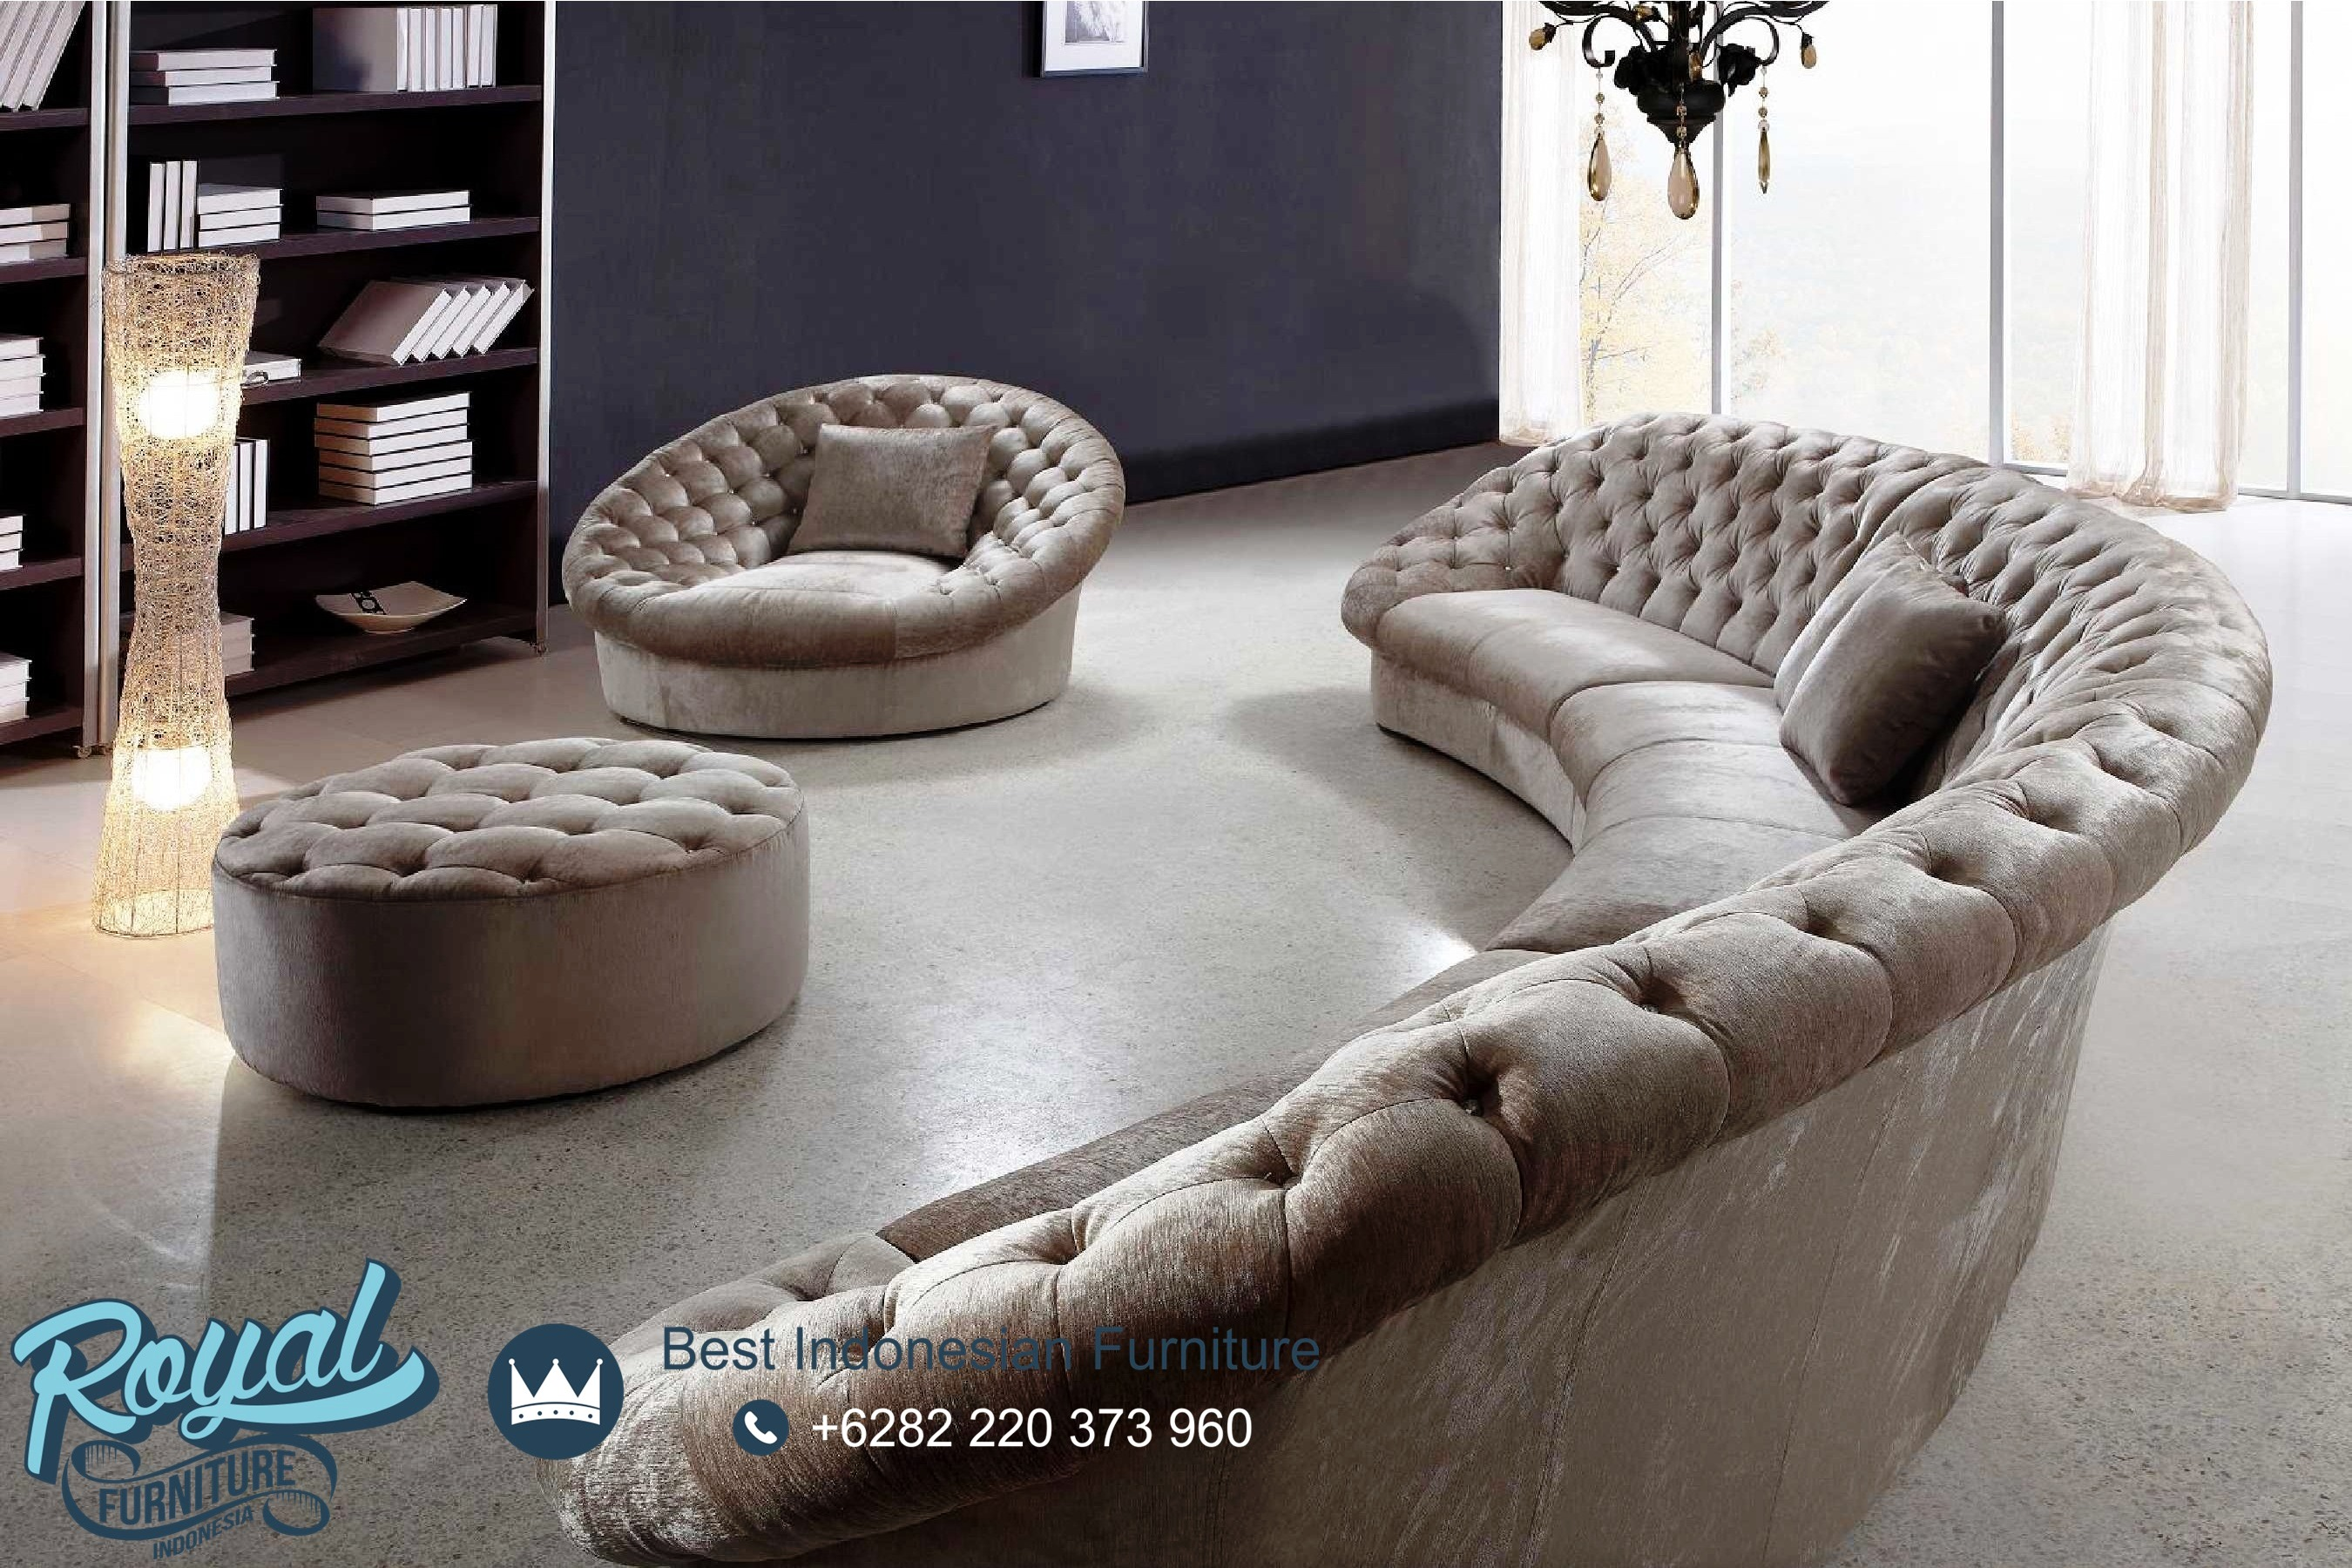 Sofa Santai Ruang Keluarga Elegan Mewah Terbaru Royal Furniture Sofa santai untuk ruang keluarga